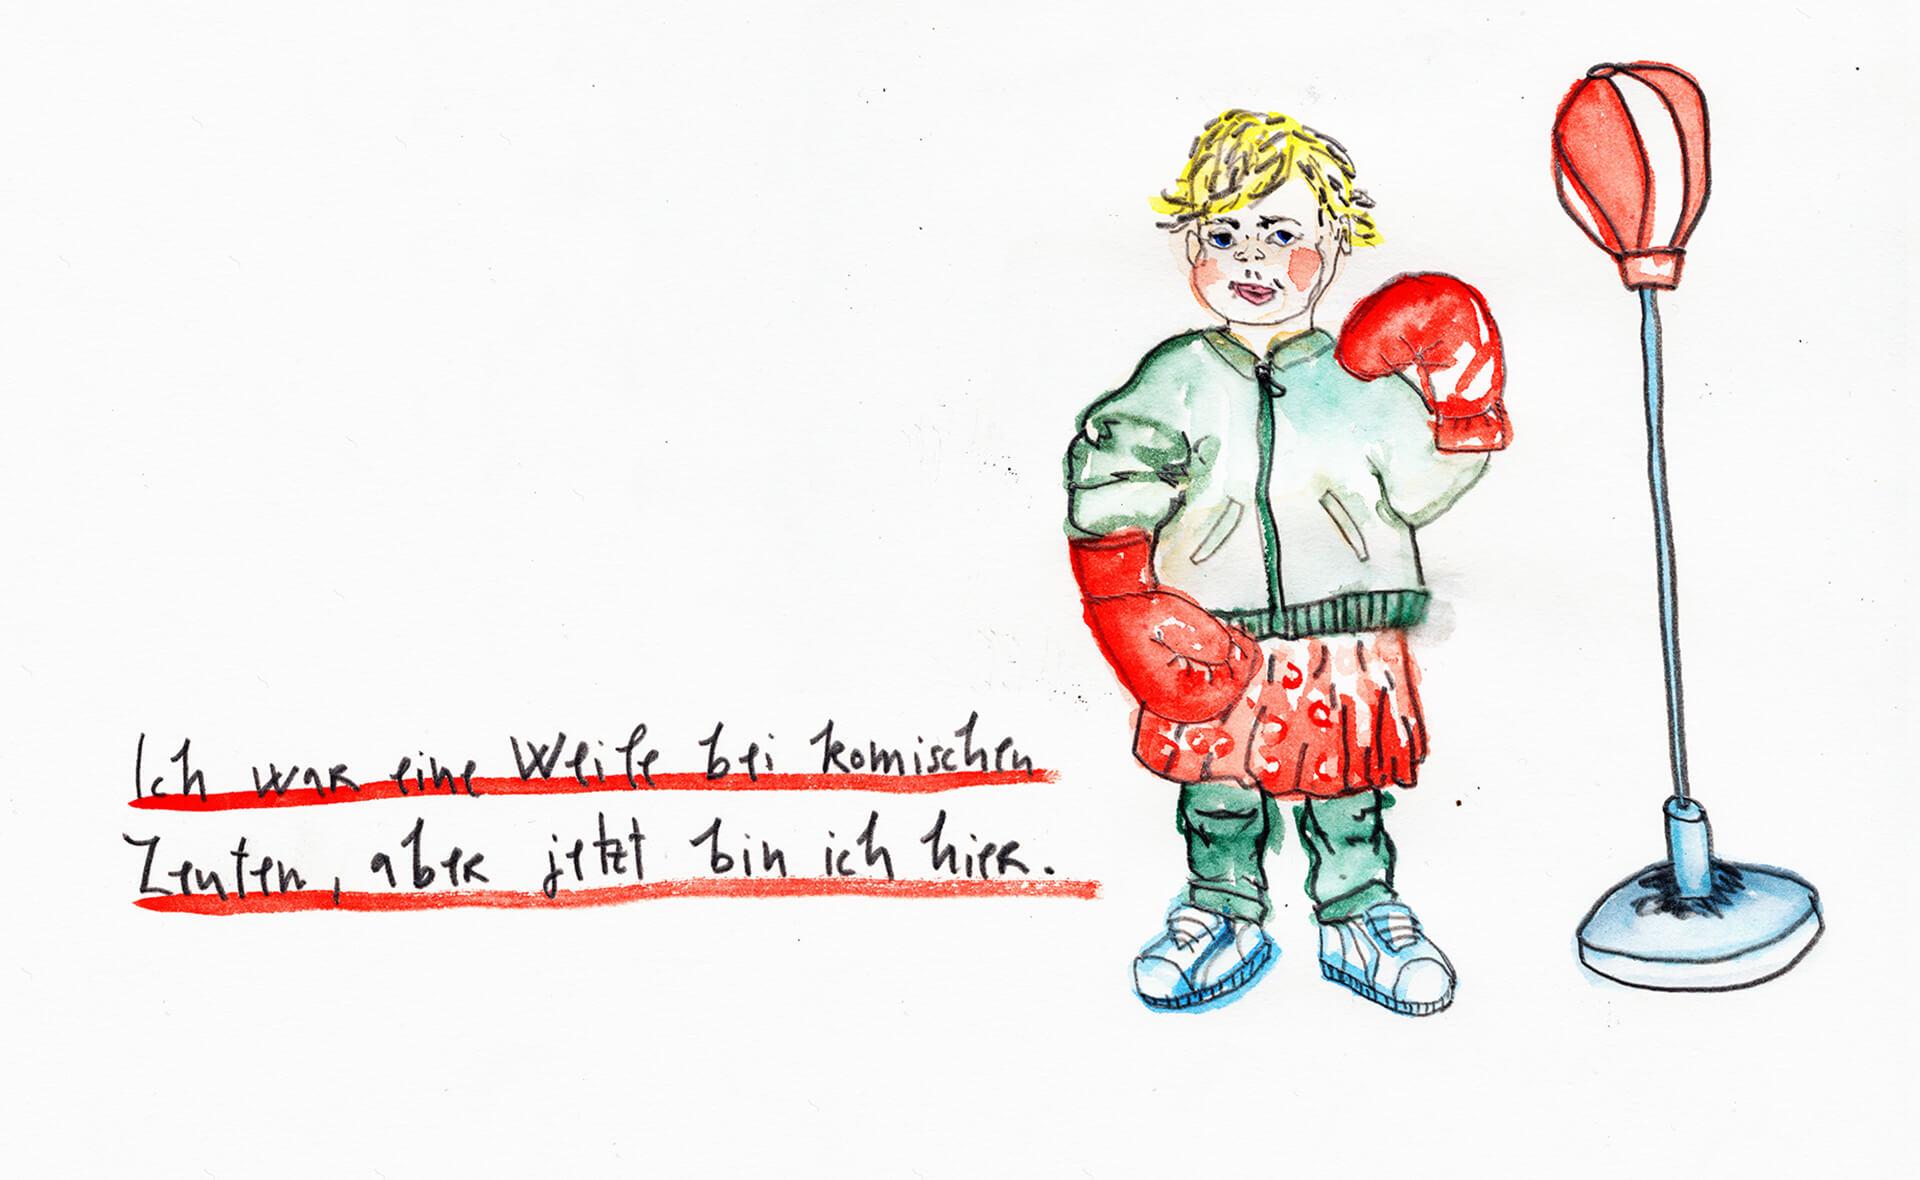 Matrosenhunde Wochenkalender Illustration, Kind, Boxhandschuhe, Zecihnung, Kleid, Junge, Sneaker, punching ball, neue Jungs